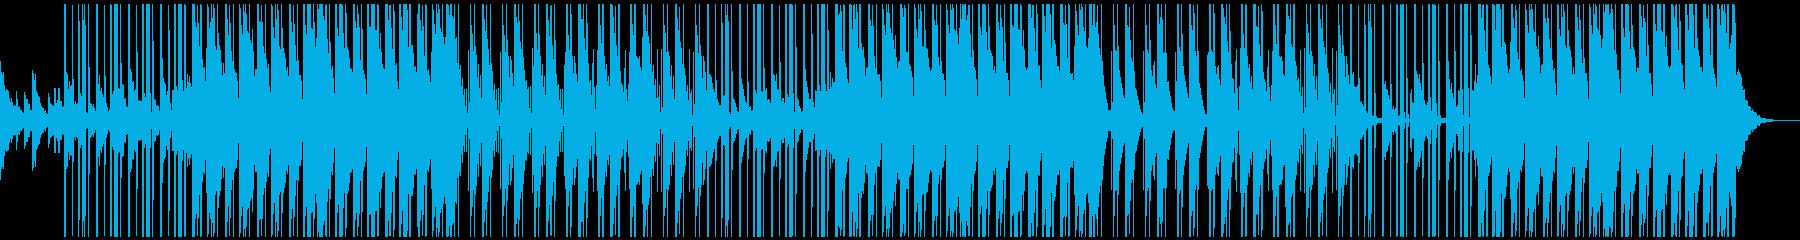 sad piano type beatの再生済みの波形